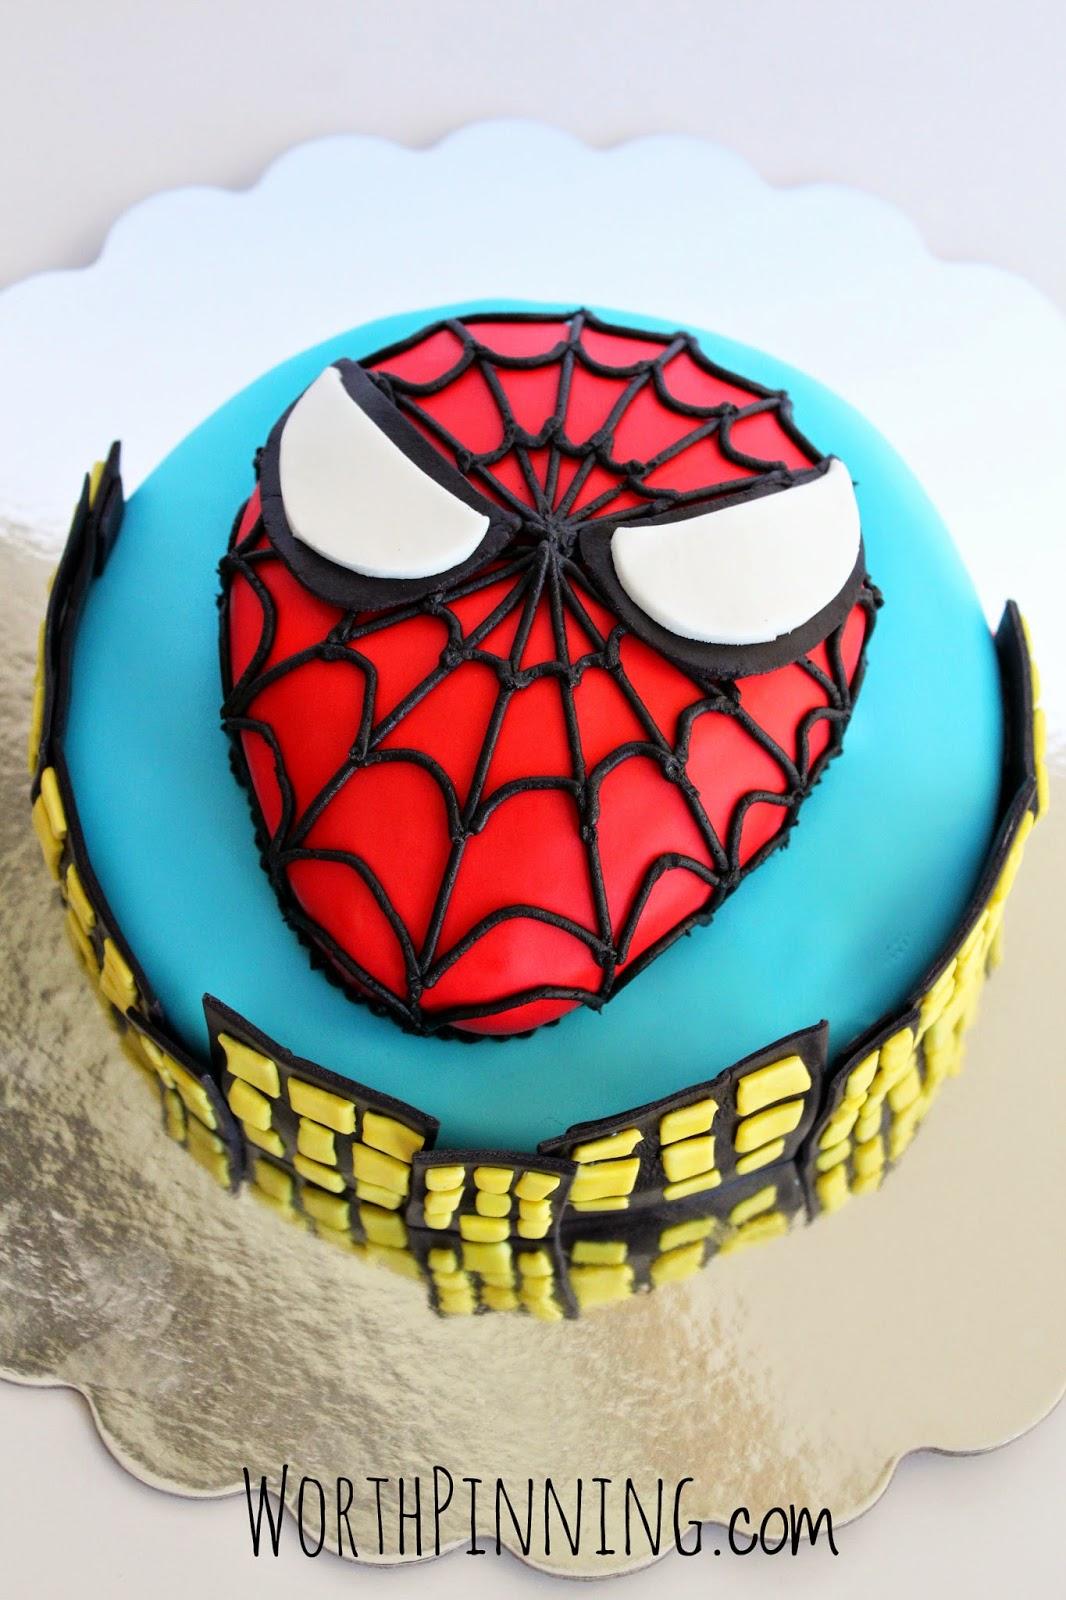 Worth Pinning An Amazing 7 Year Old Boy Spider Man Cake